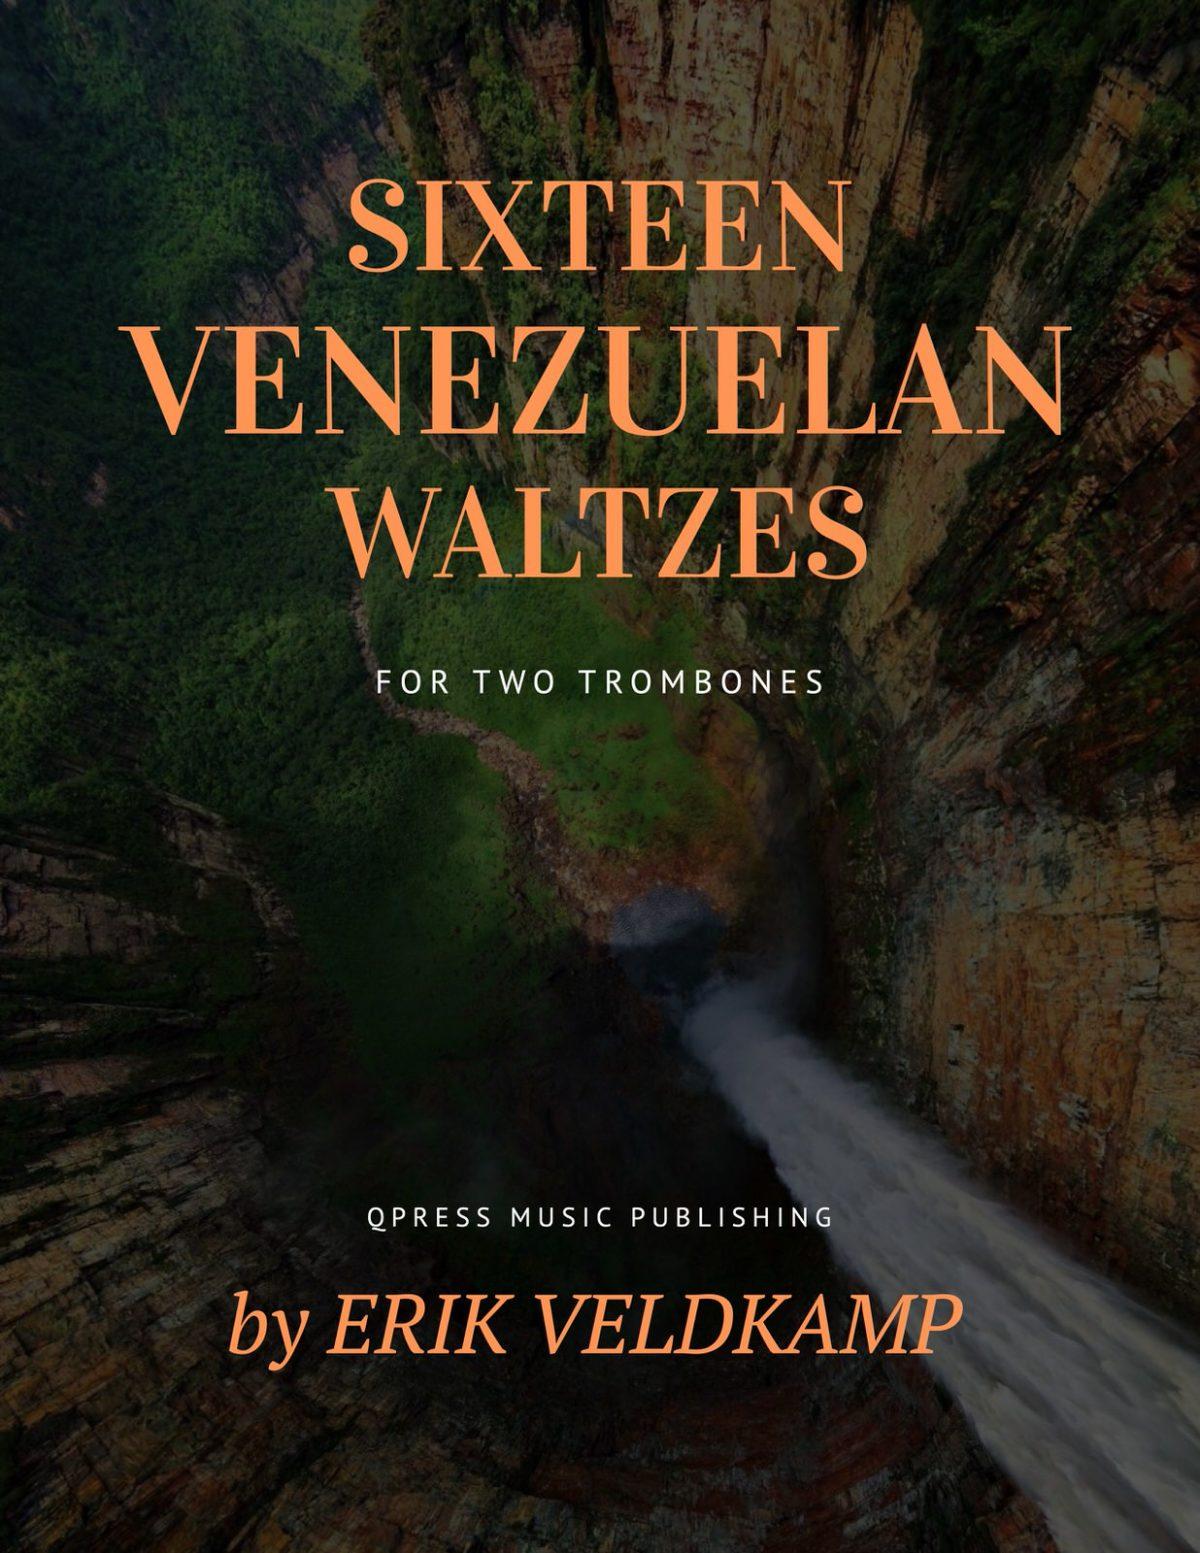 Veldkamp, 16 Venezuelan Waltzes for Trombone-p01